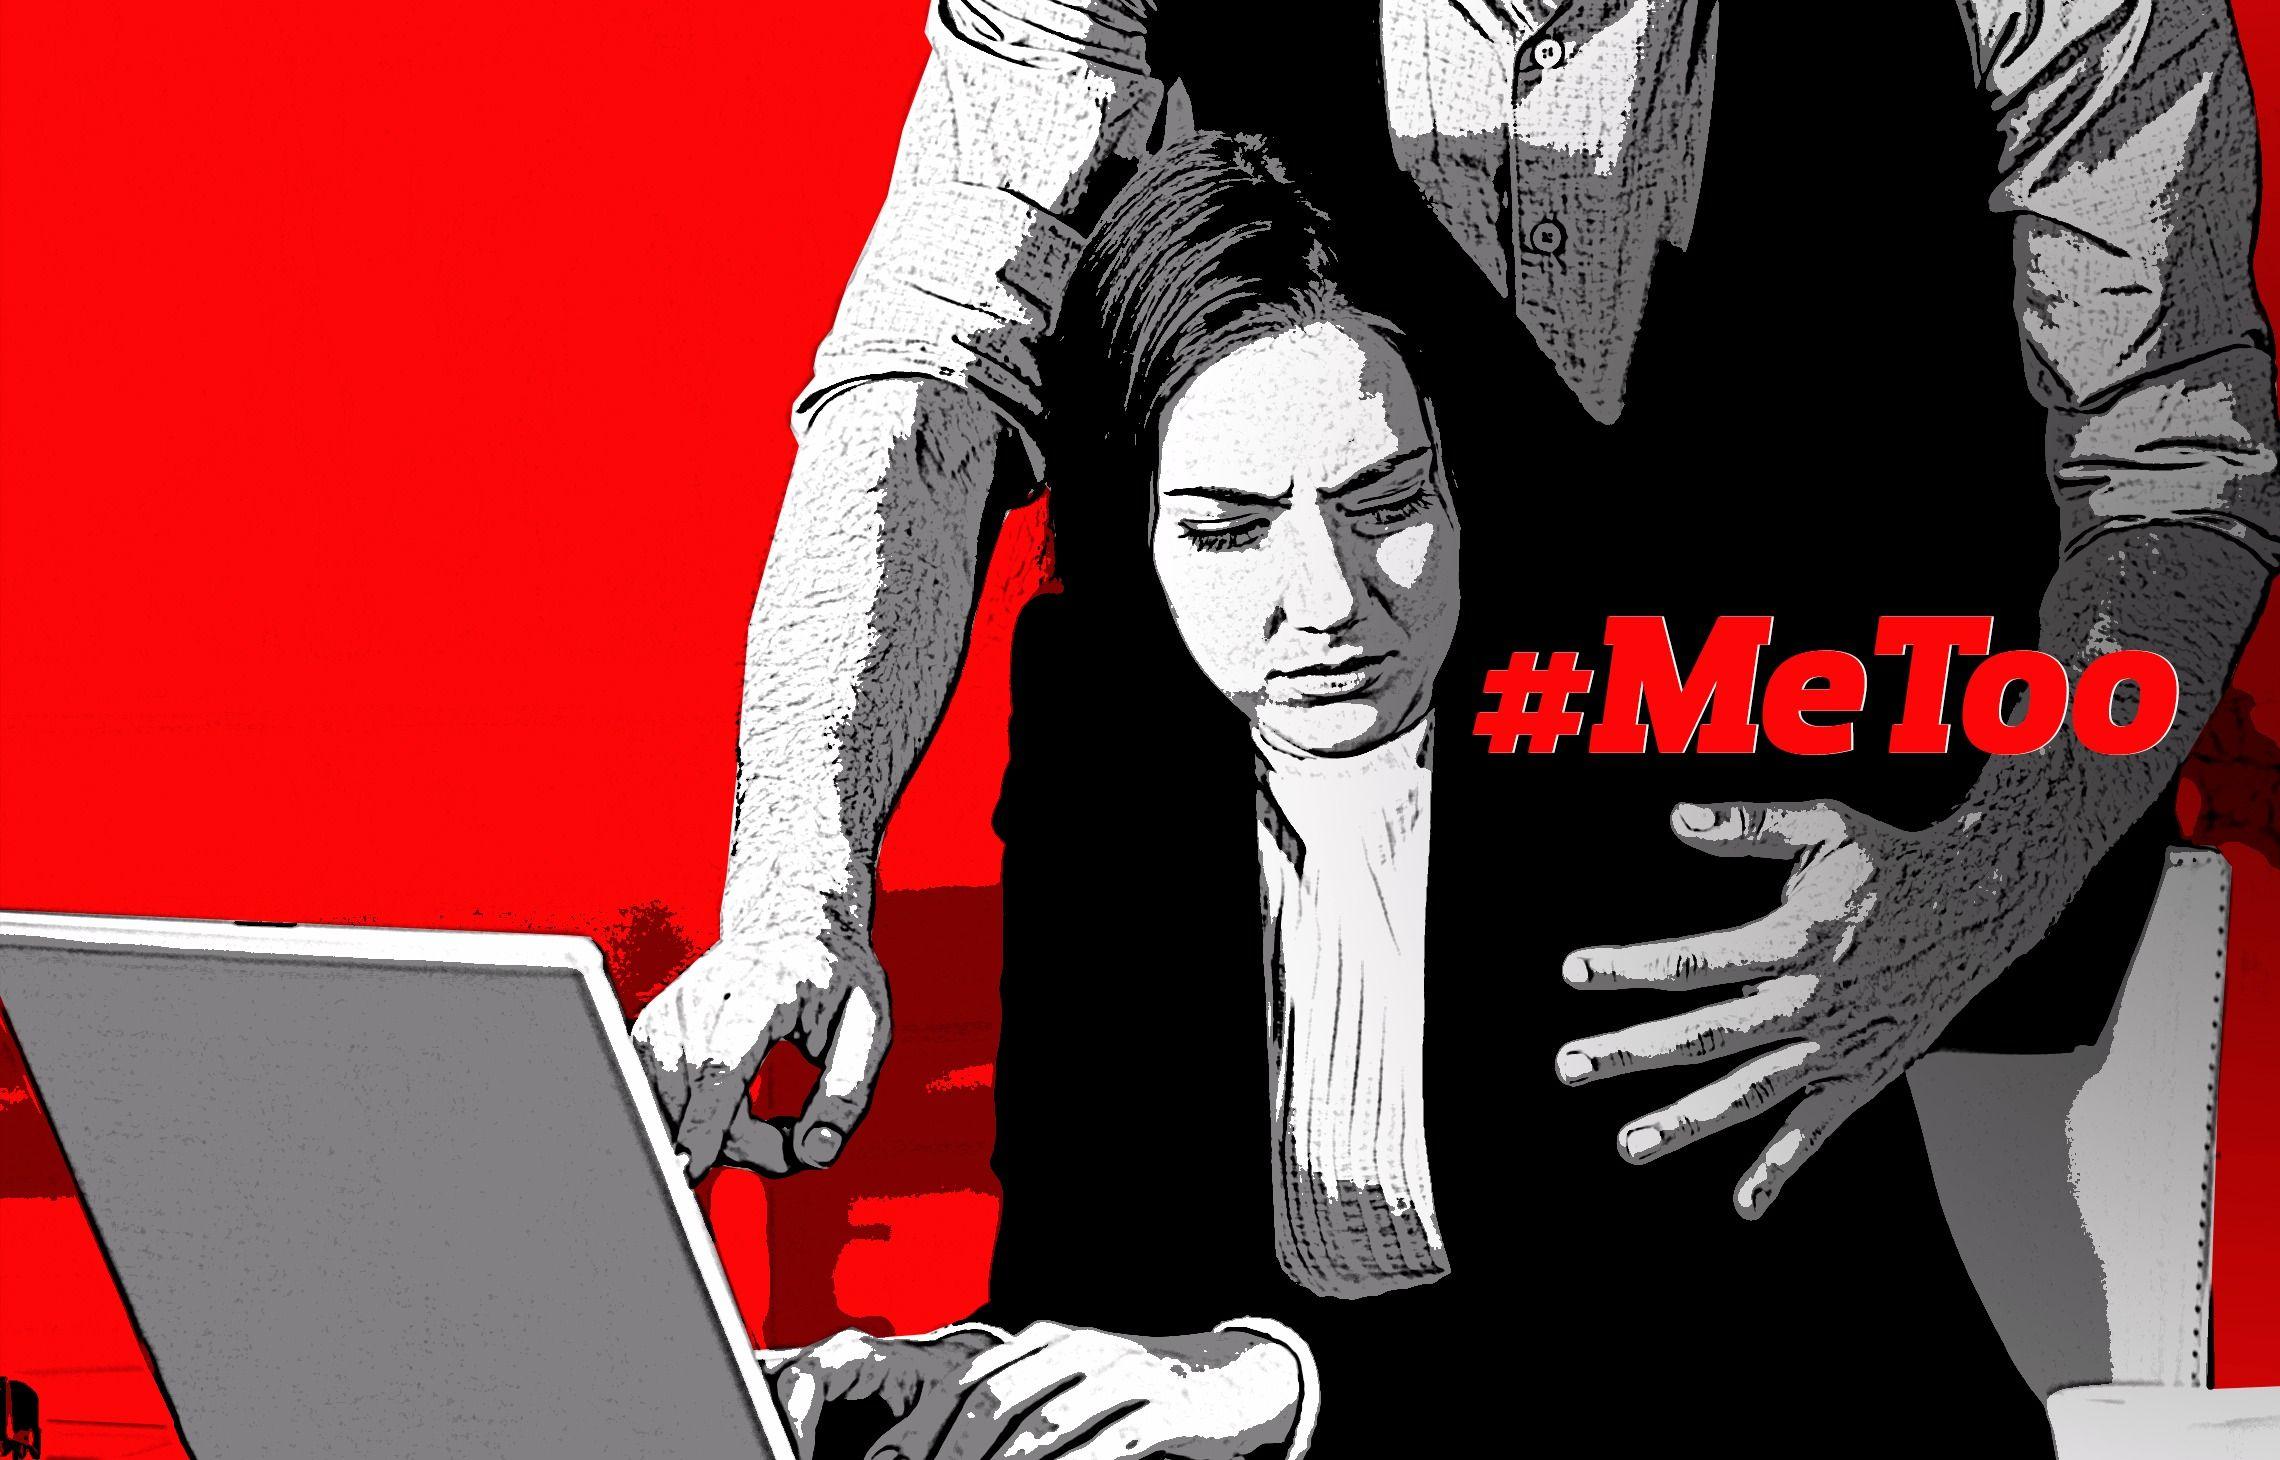 #MeToo, #MeToo in India, Women empowerment, women in india, मीटू, मैं भी, उत्पीडन, यौन उत्पीडन, बुलंद आवाज़, तनुश्री दत्ता, नाना पाटेकर, महिला